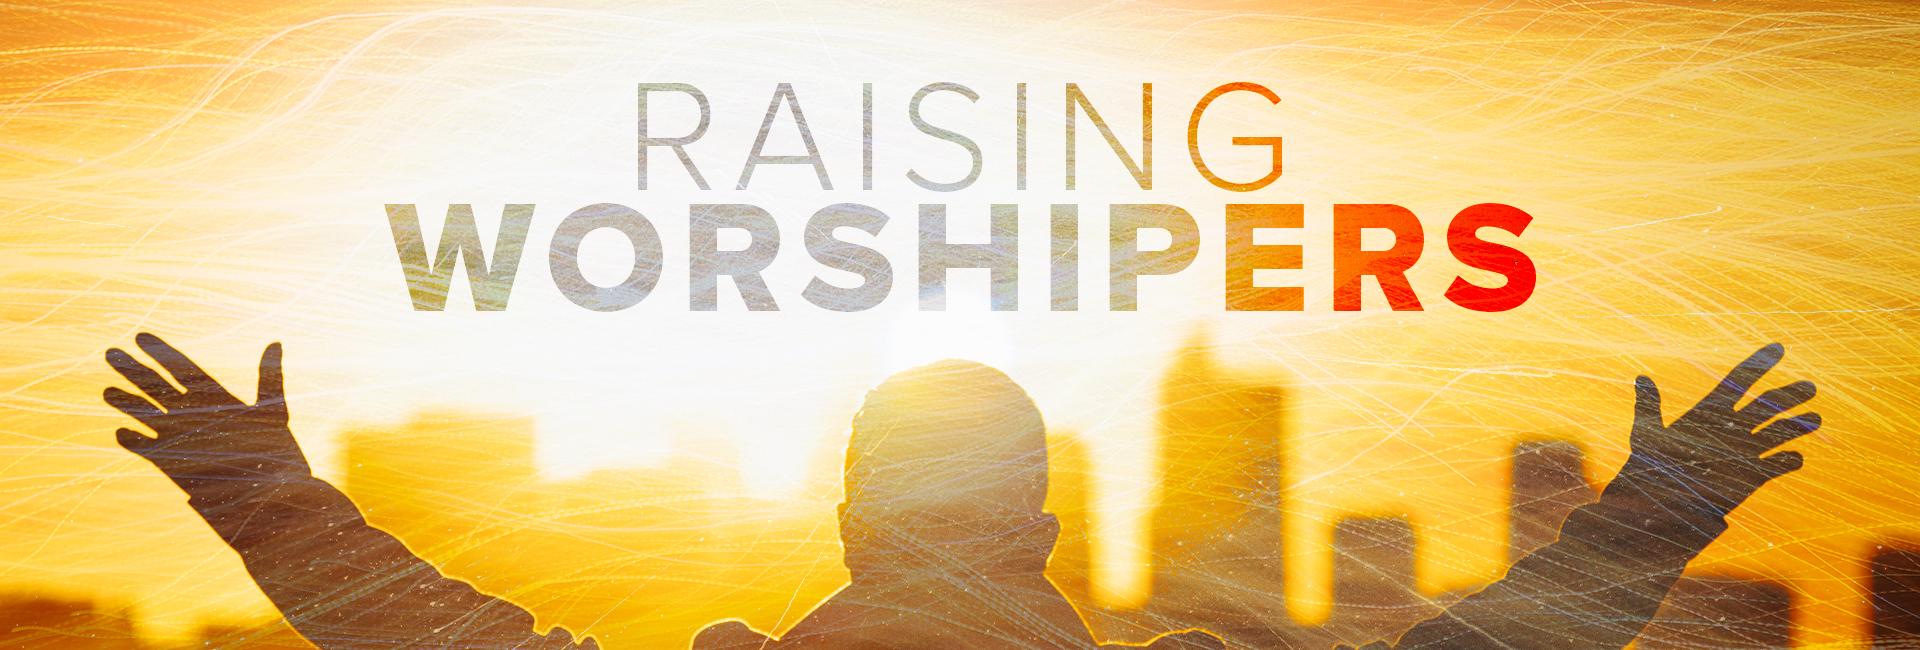 Raising Worshipers